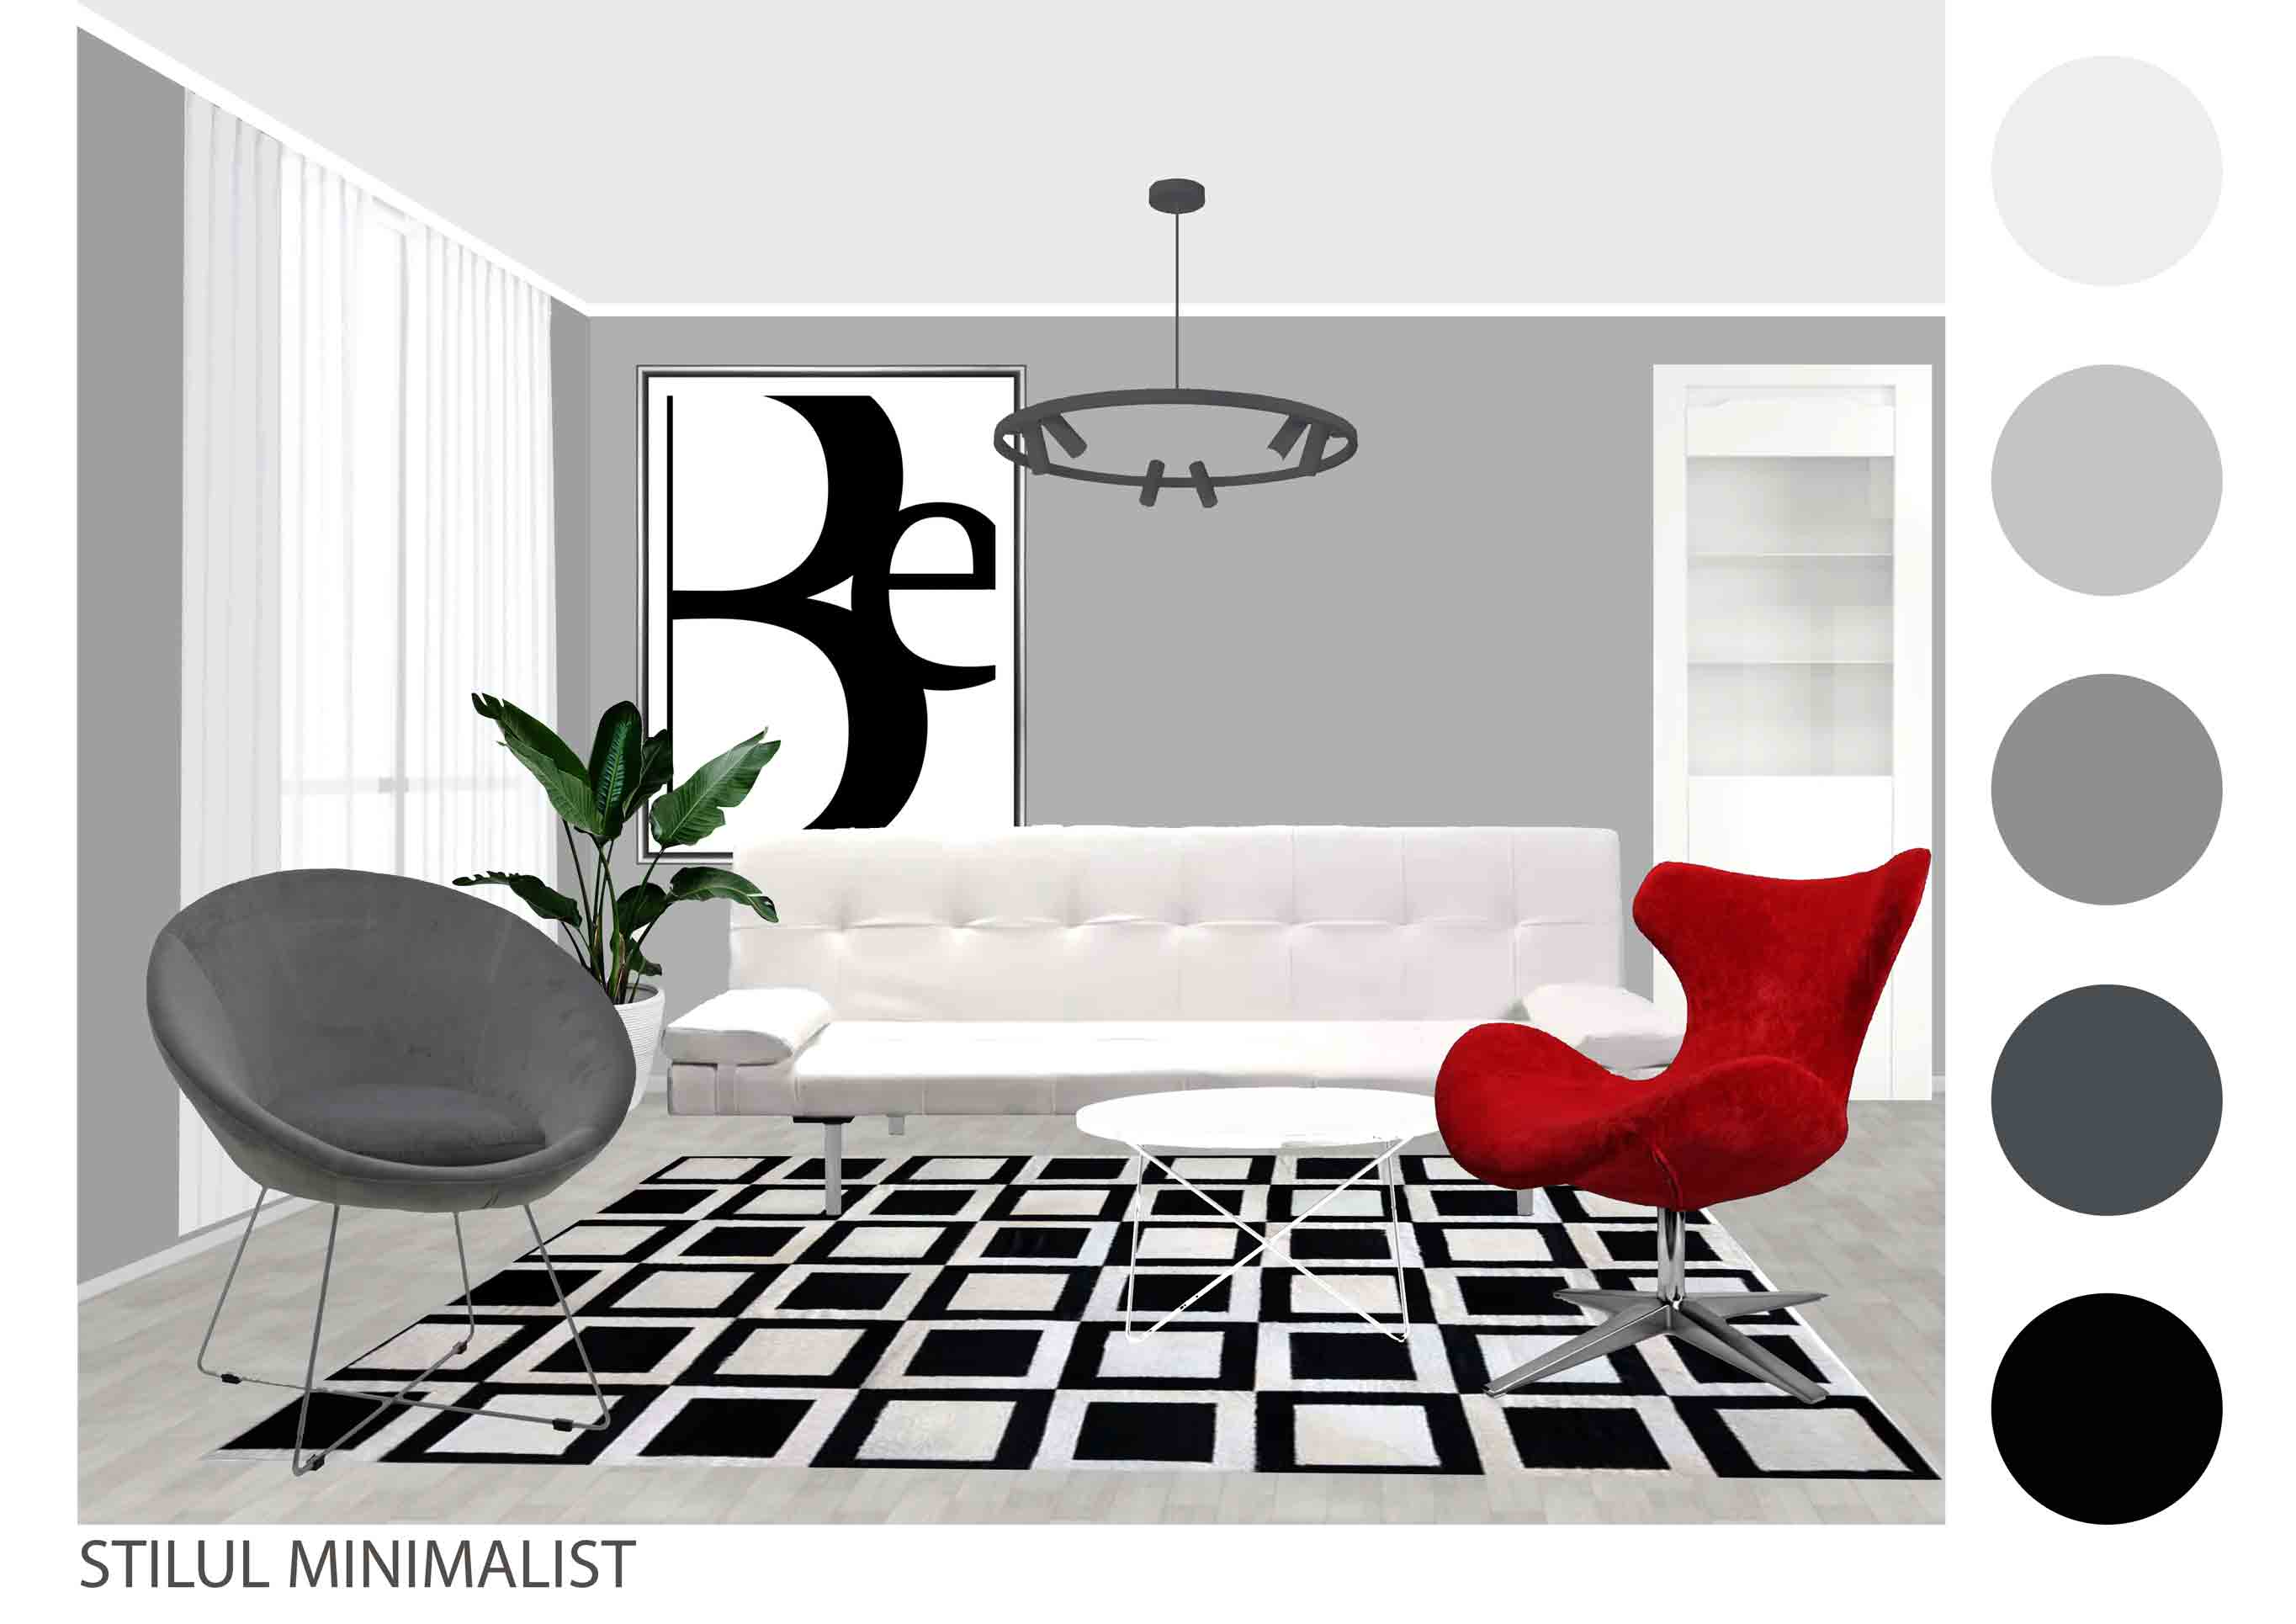 living in stil minimalist